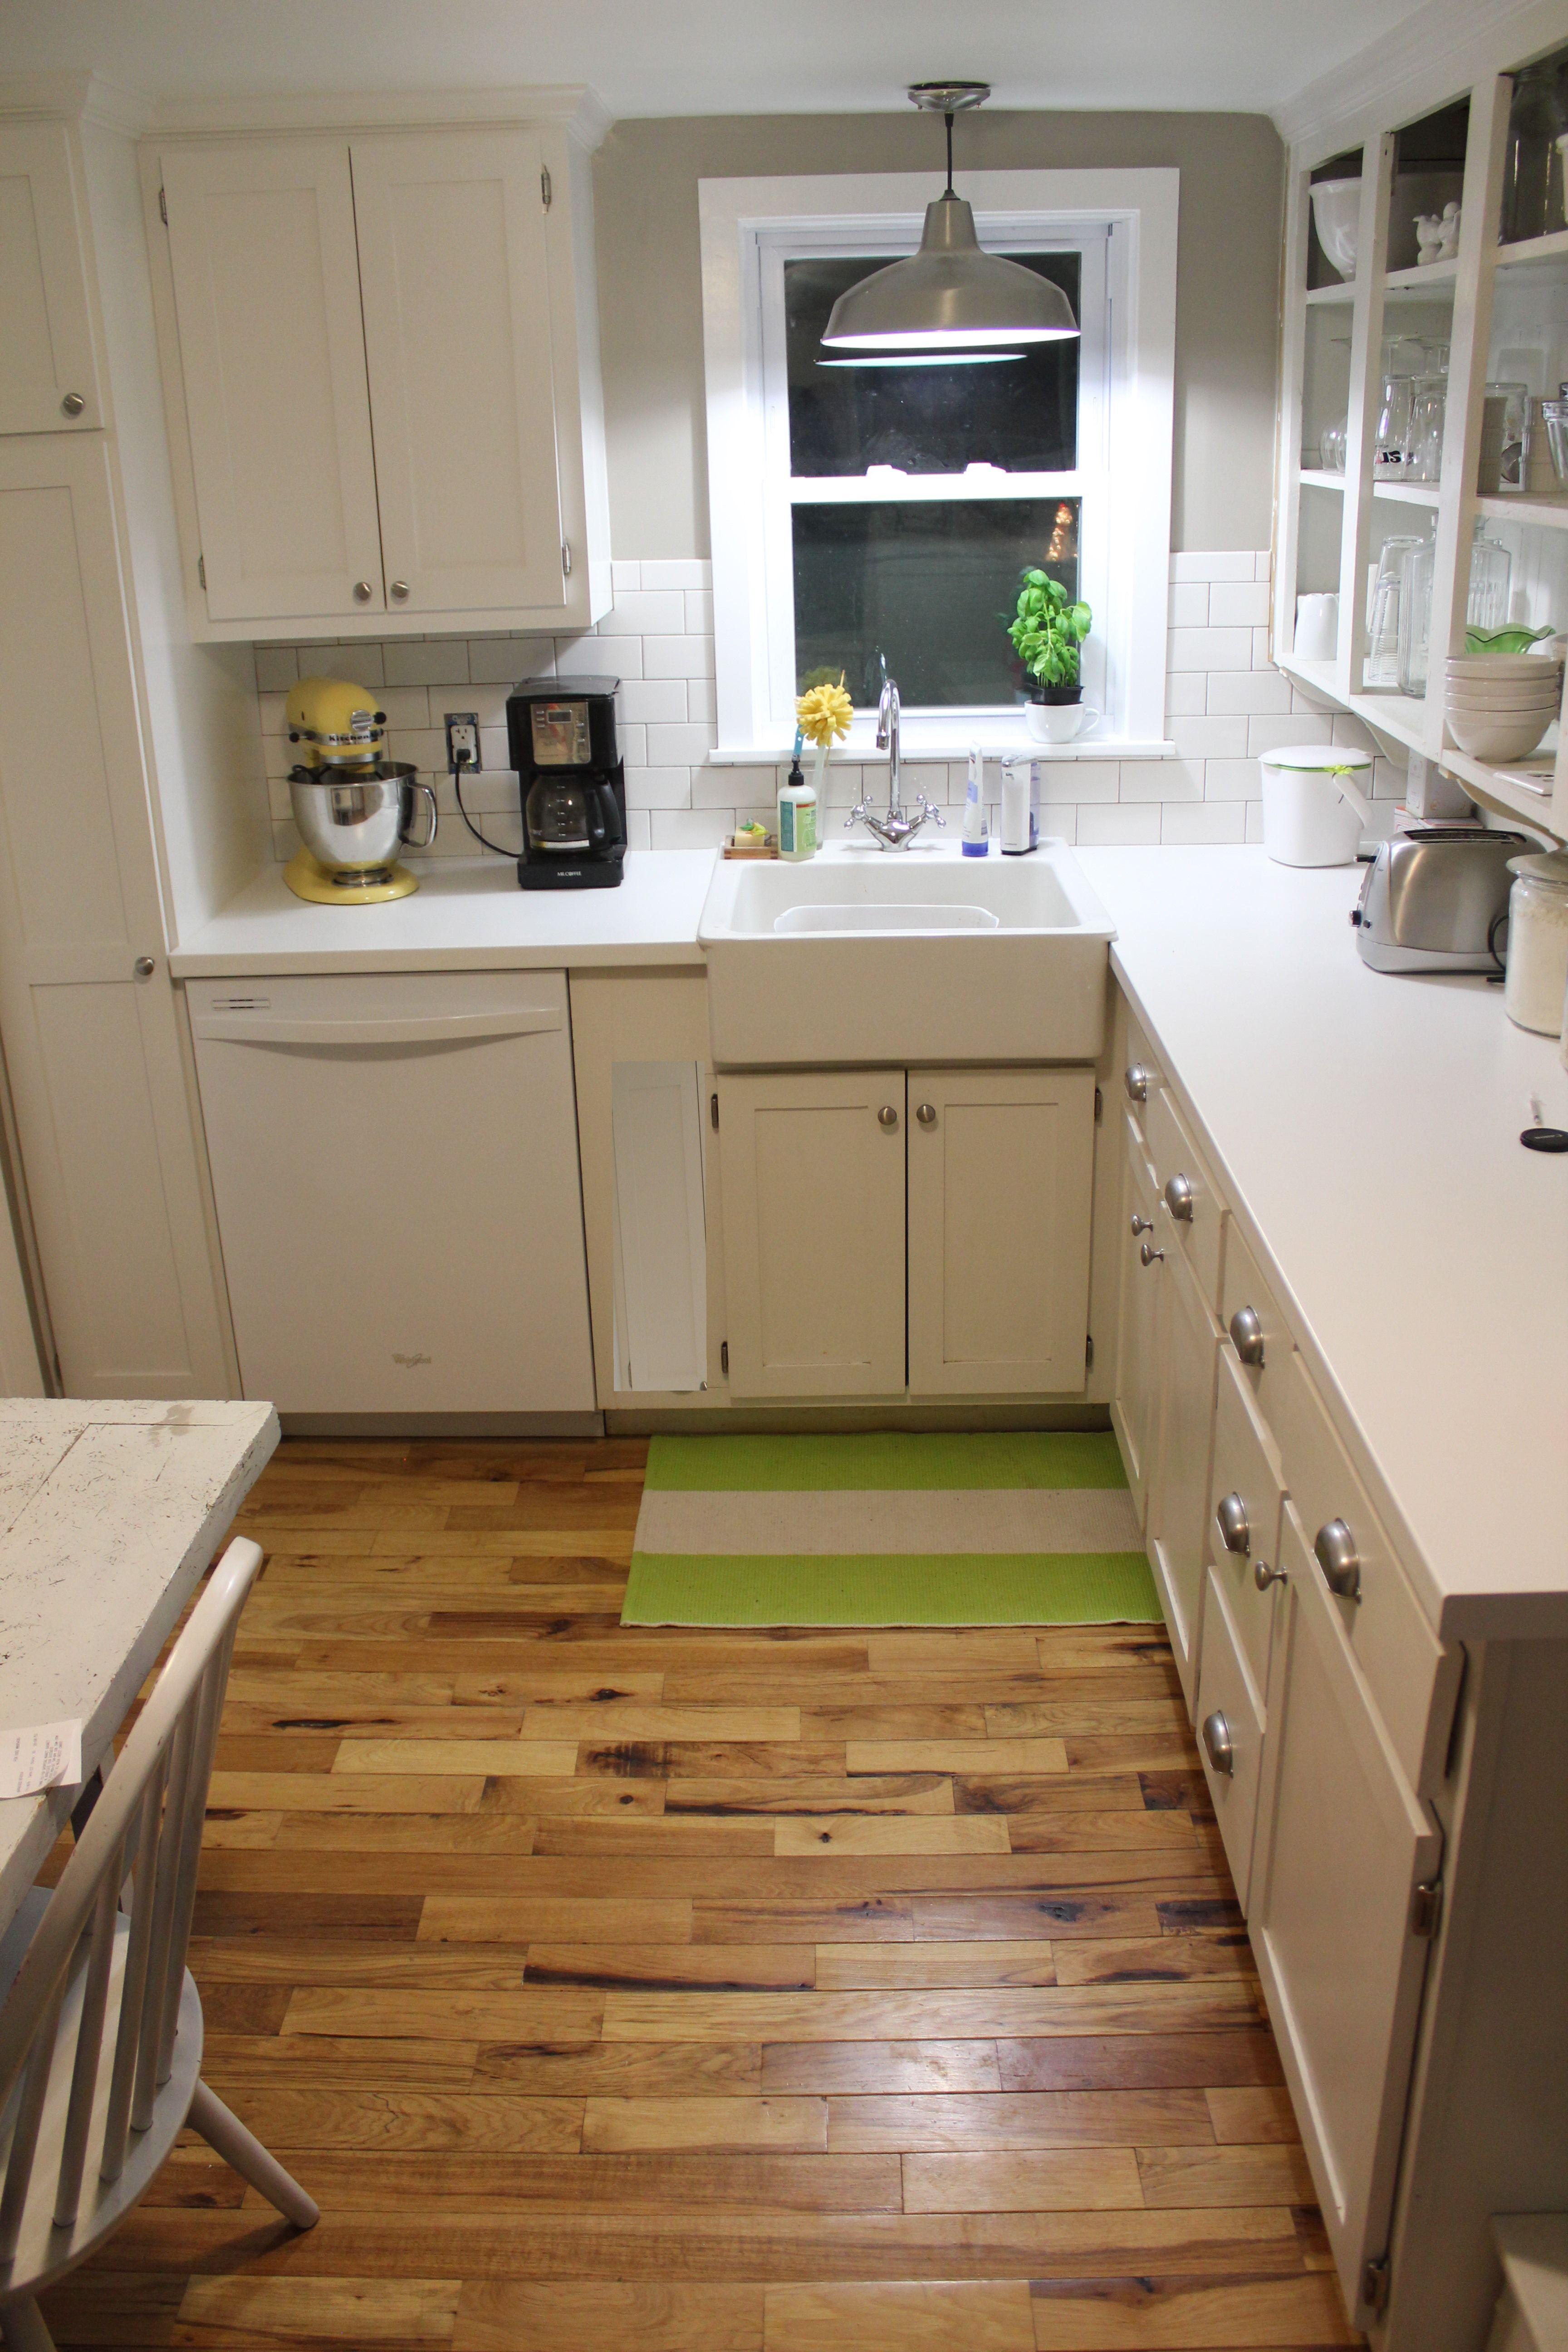 108 Square Foot Kitchen Completely Redone Ikea Pragel